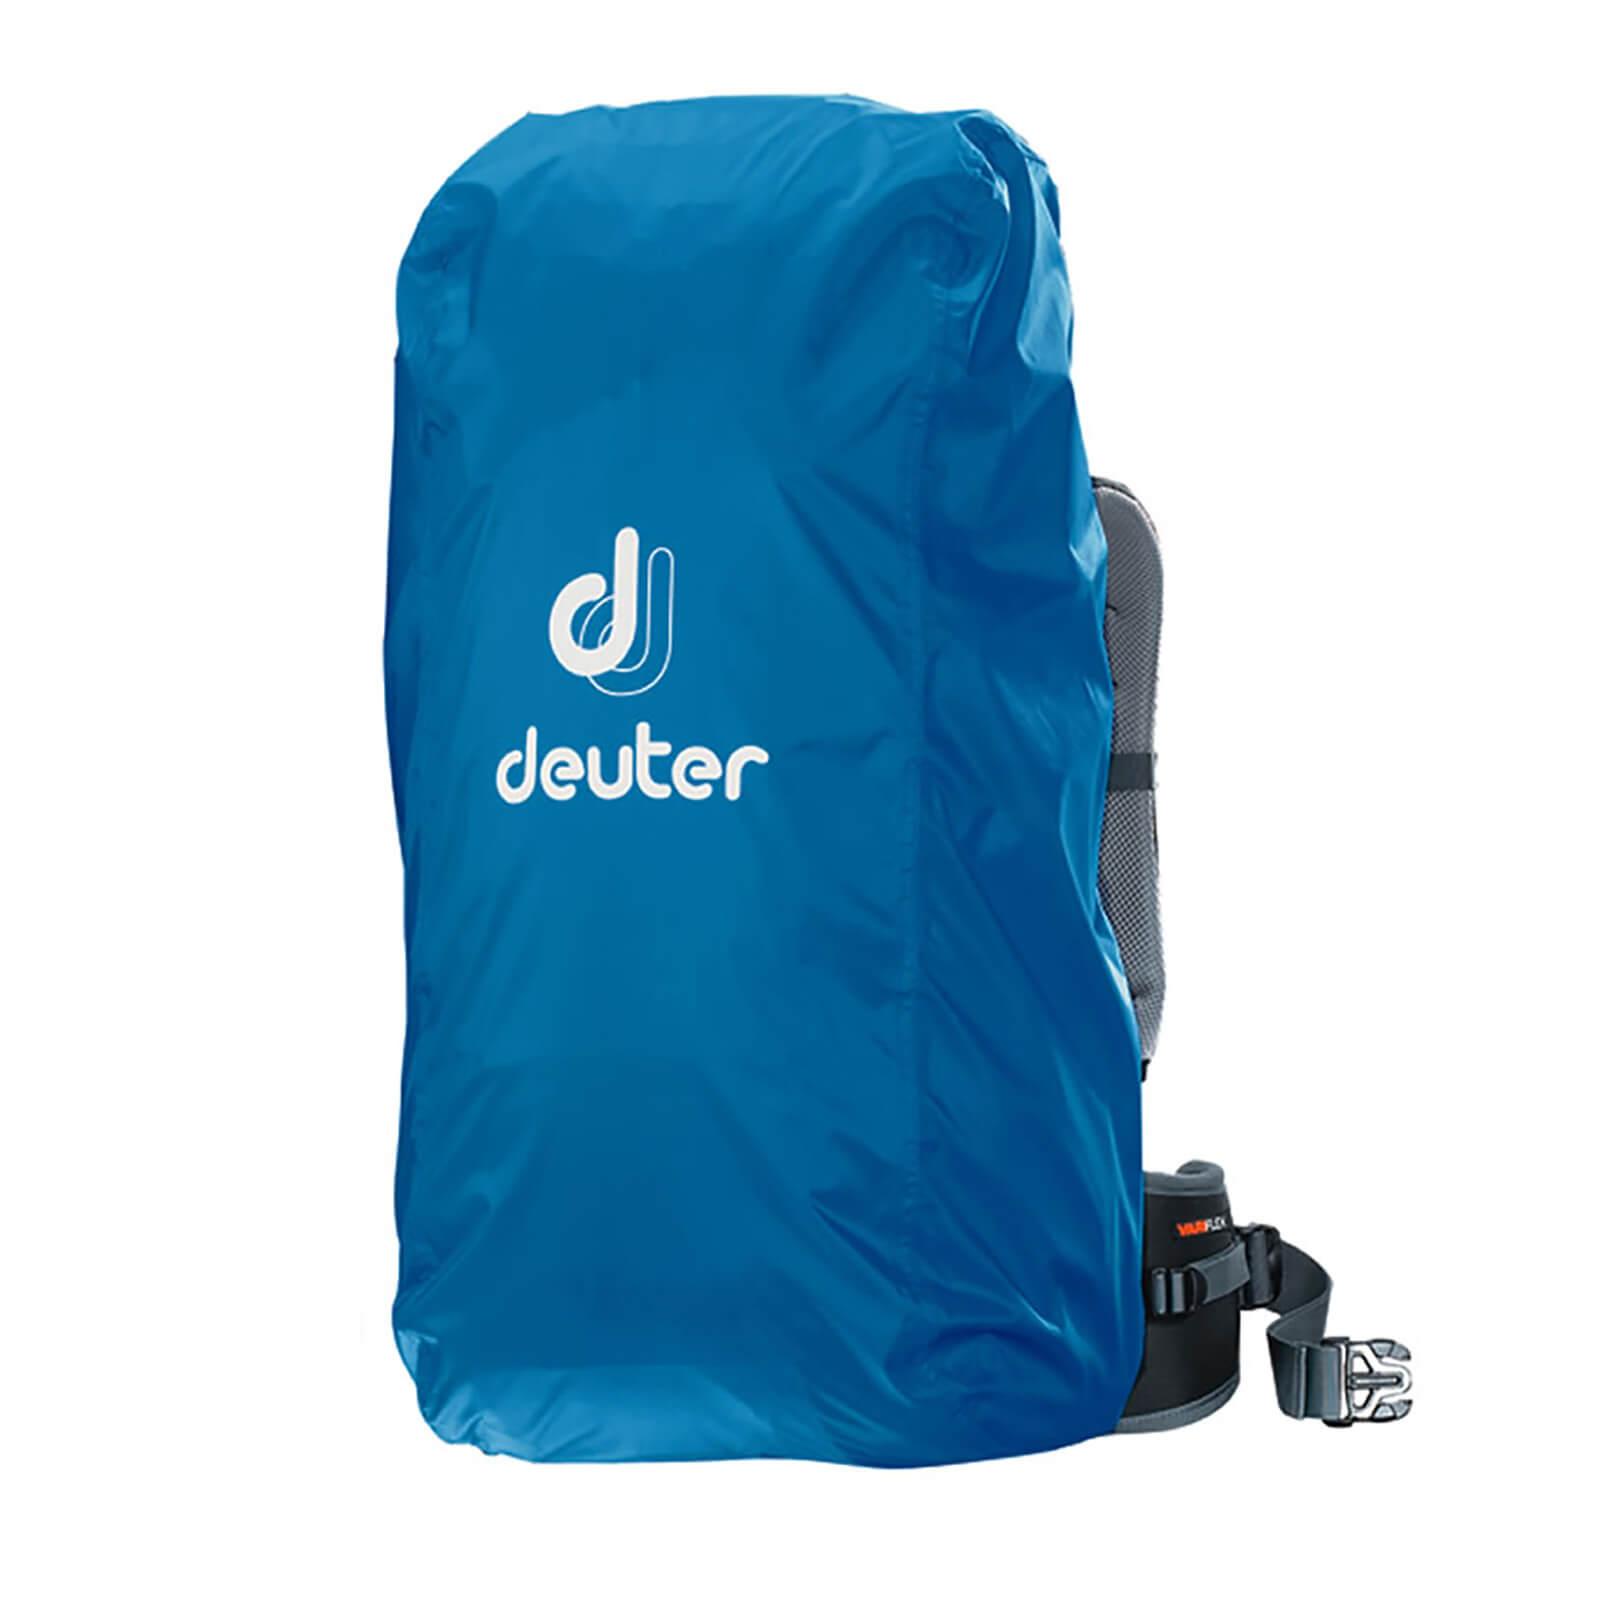 Deuter Backpack Raincover 3 - Cool Blue